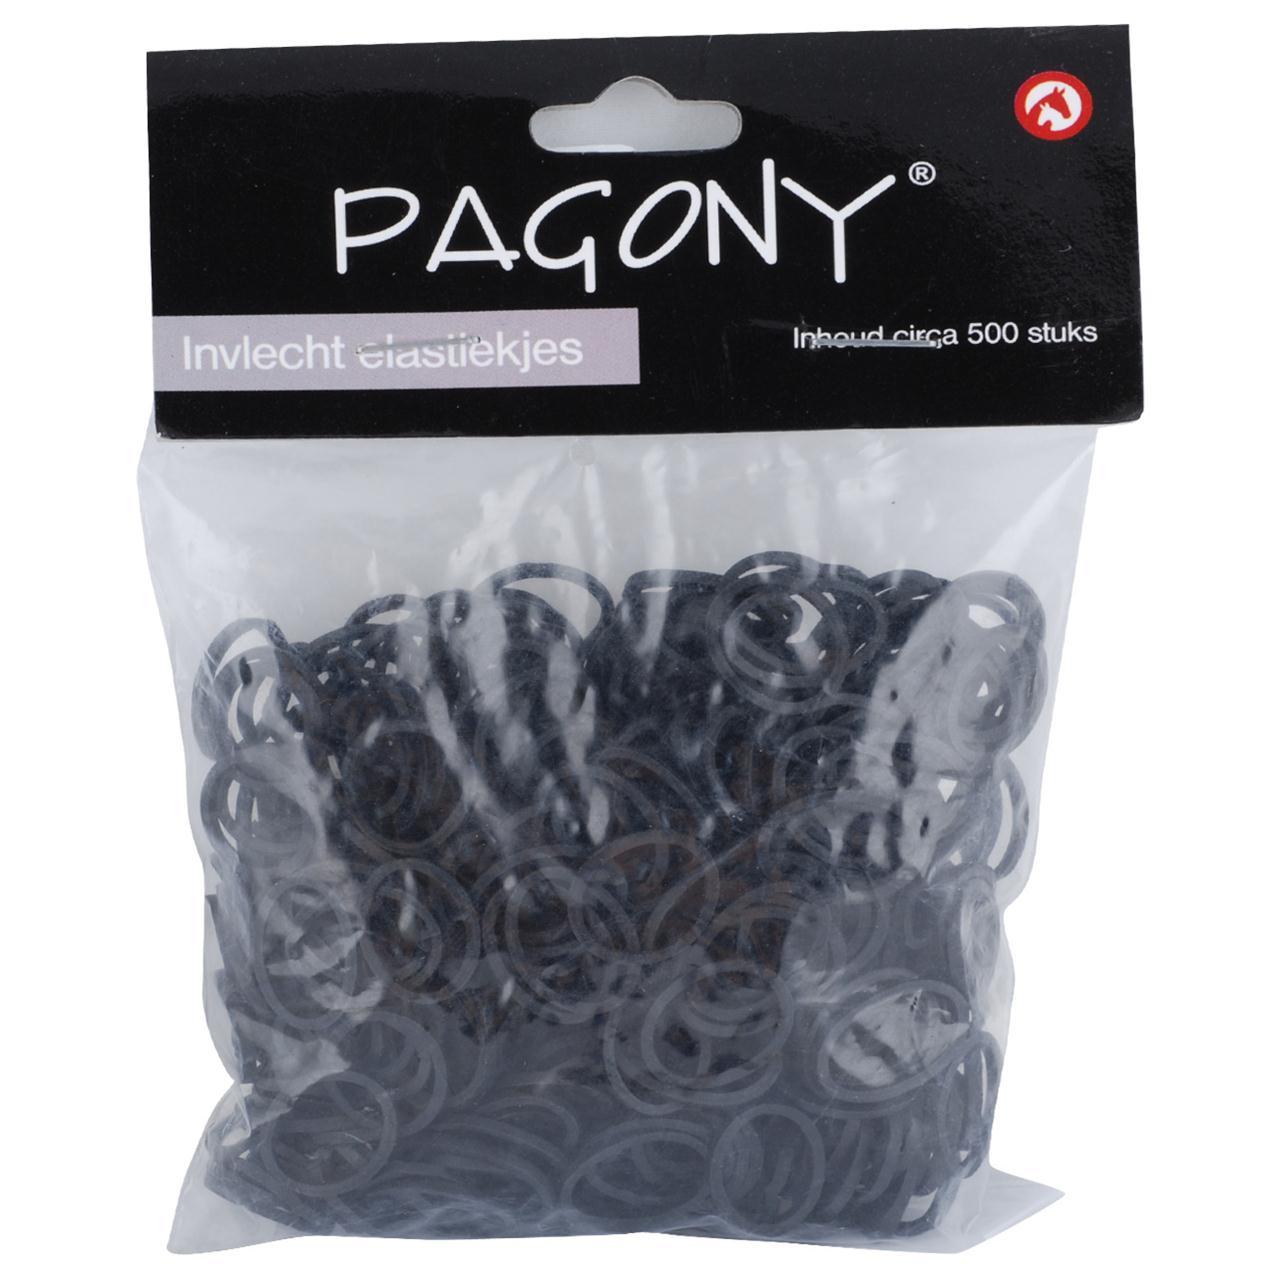 Invlecht elastiekjes zwart